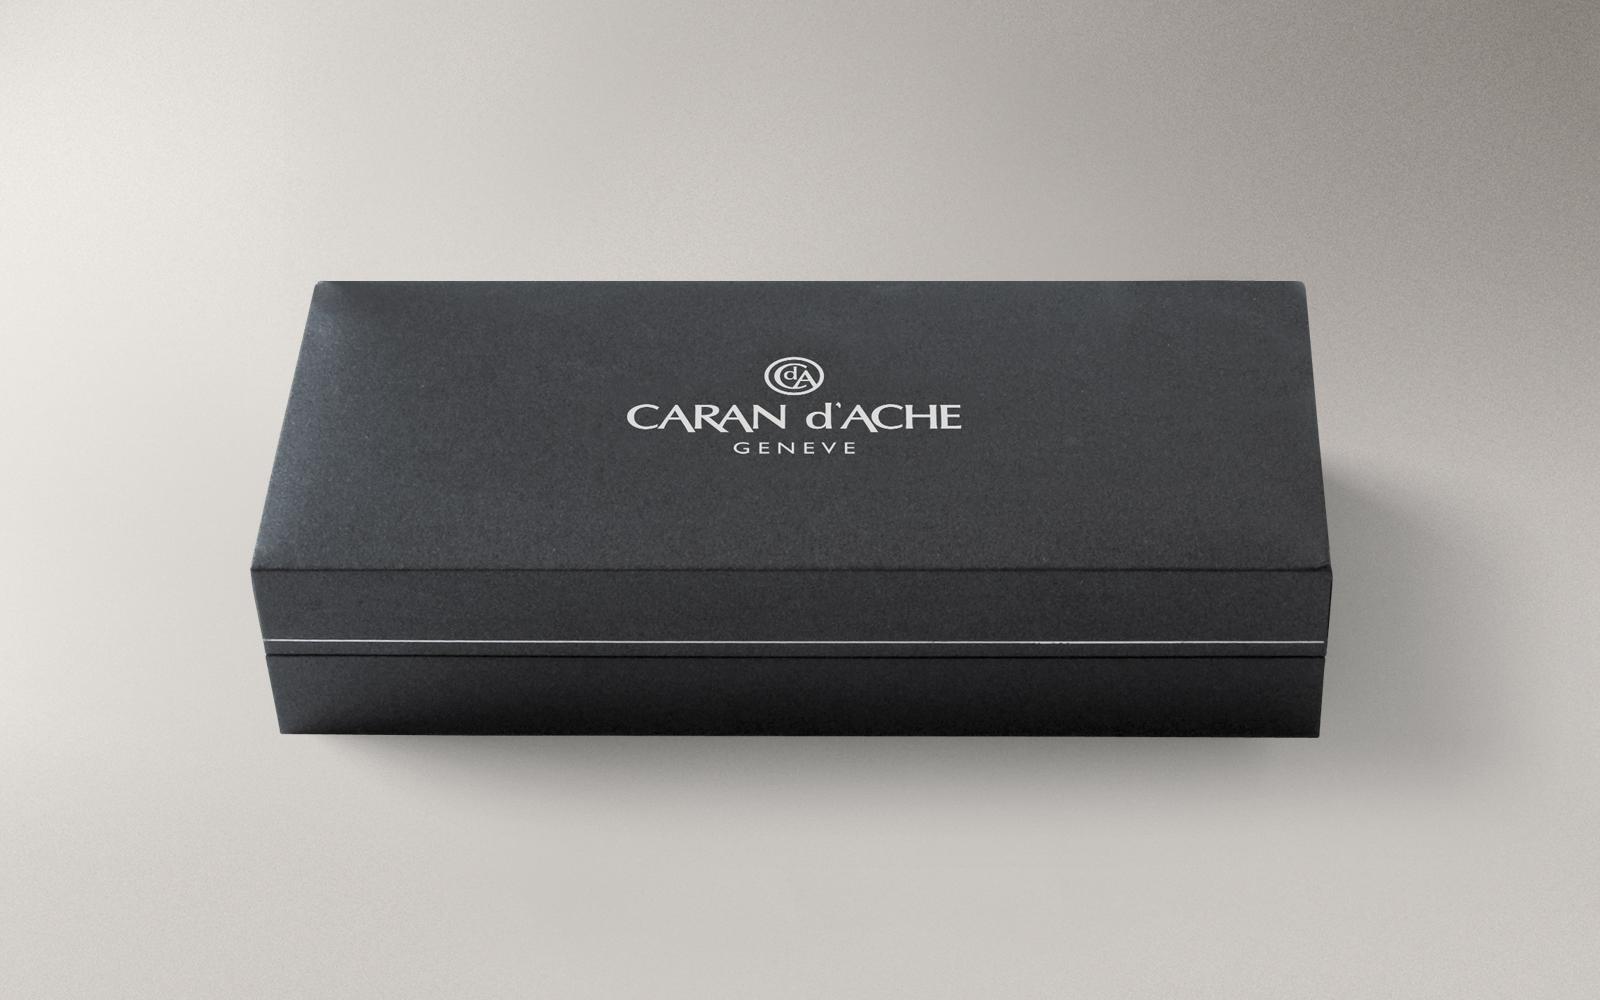 Carandache Ecridor - Yacht Club PC, шариковая ручка, F